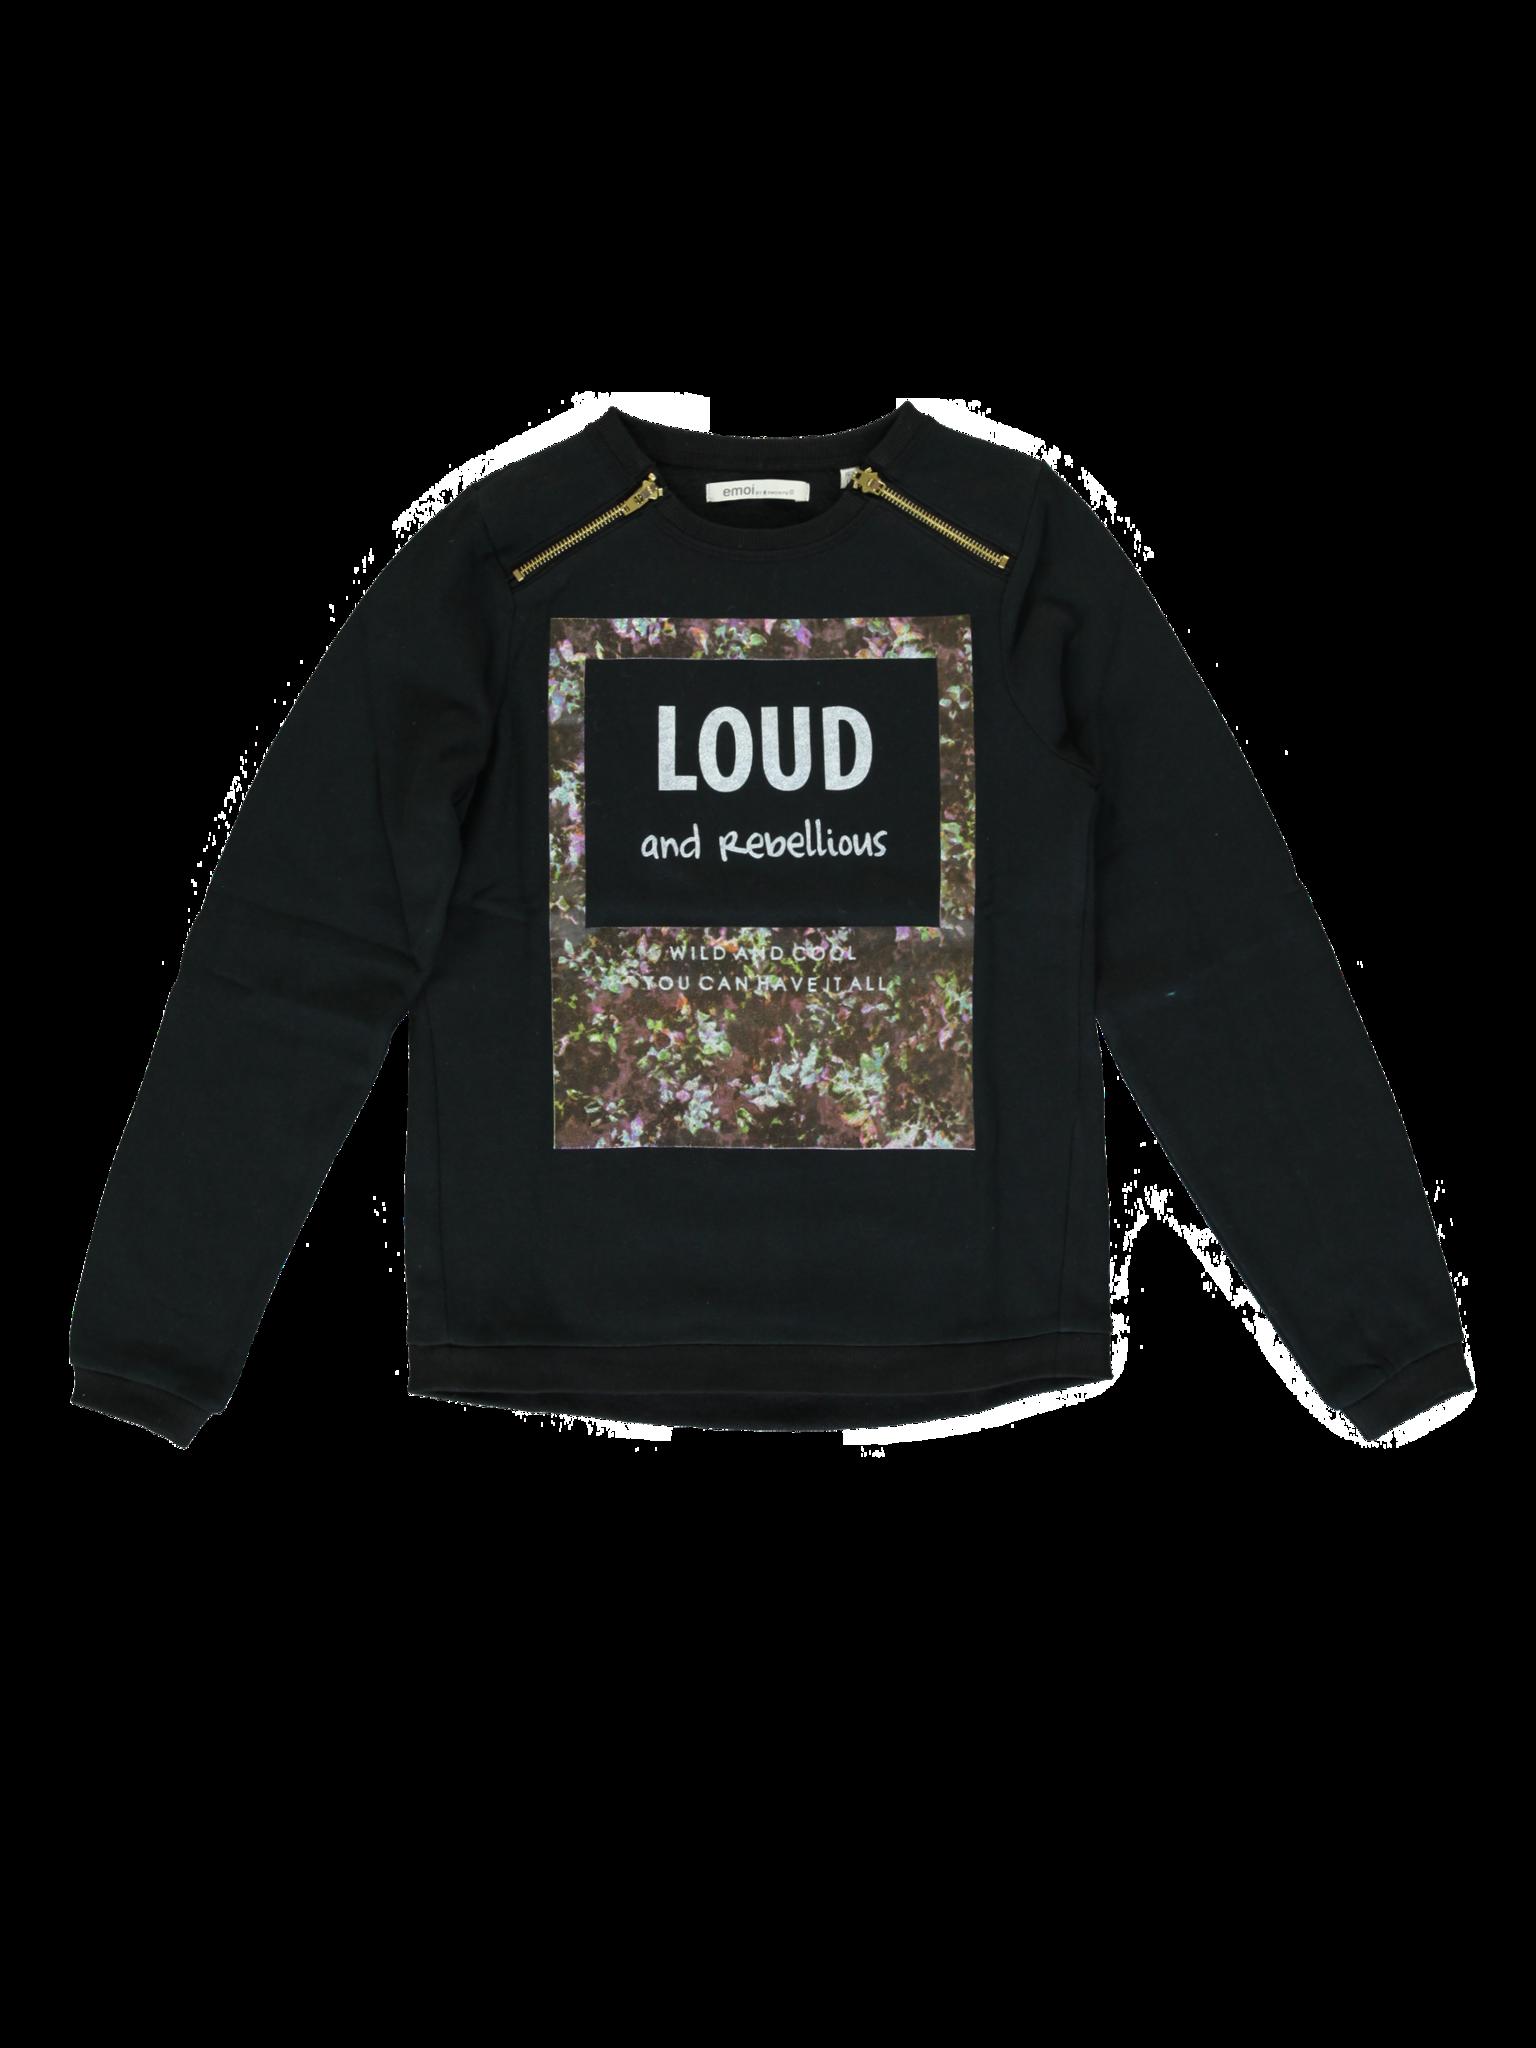 All Brands | Winterproducts Teen Girls | Sweatshirt | 24 pcs/box